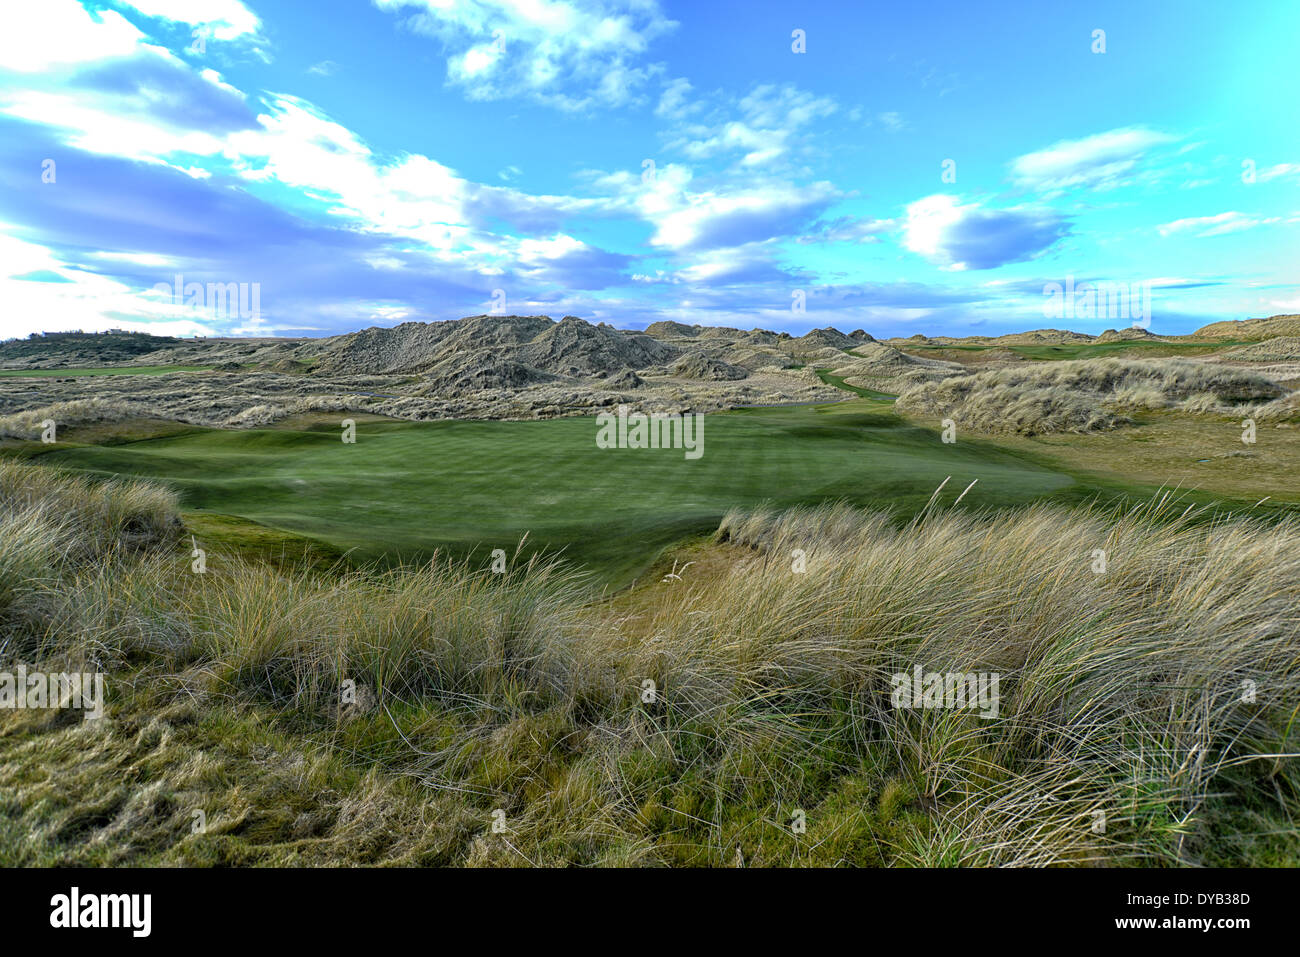 Image of Trump International Golf Links in Aberdeen, Scotland - Stock Image